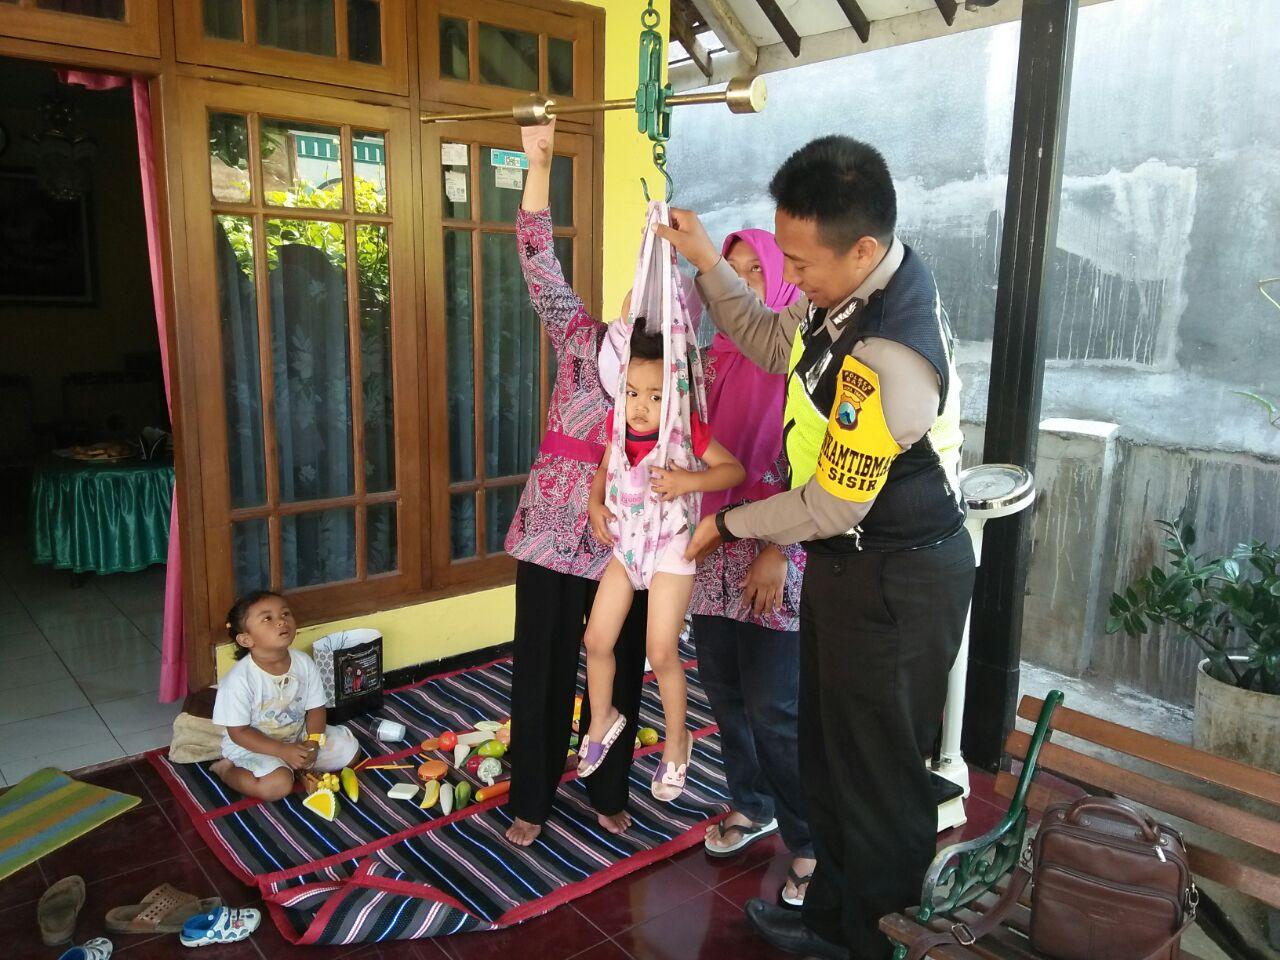 Anggota Bhabinkamtibmas Polsek Batu Lakukan Sambang Dialogis Ke Posyandu Desa Binaan